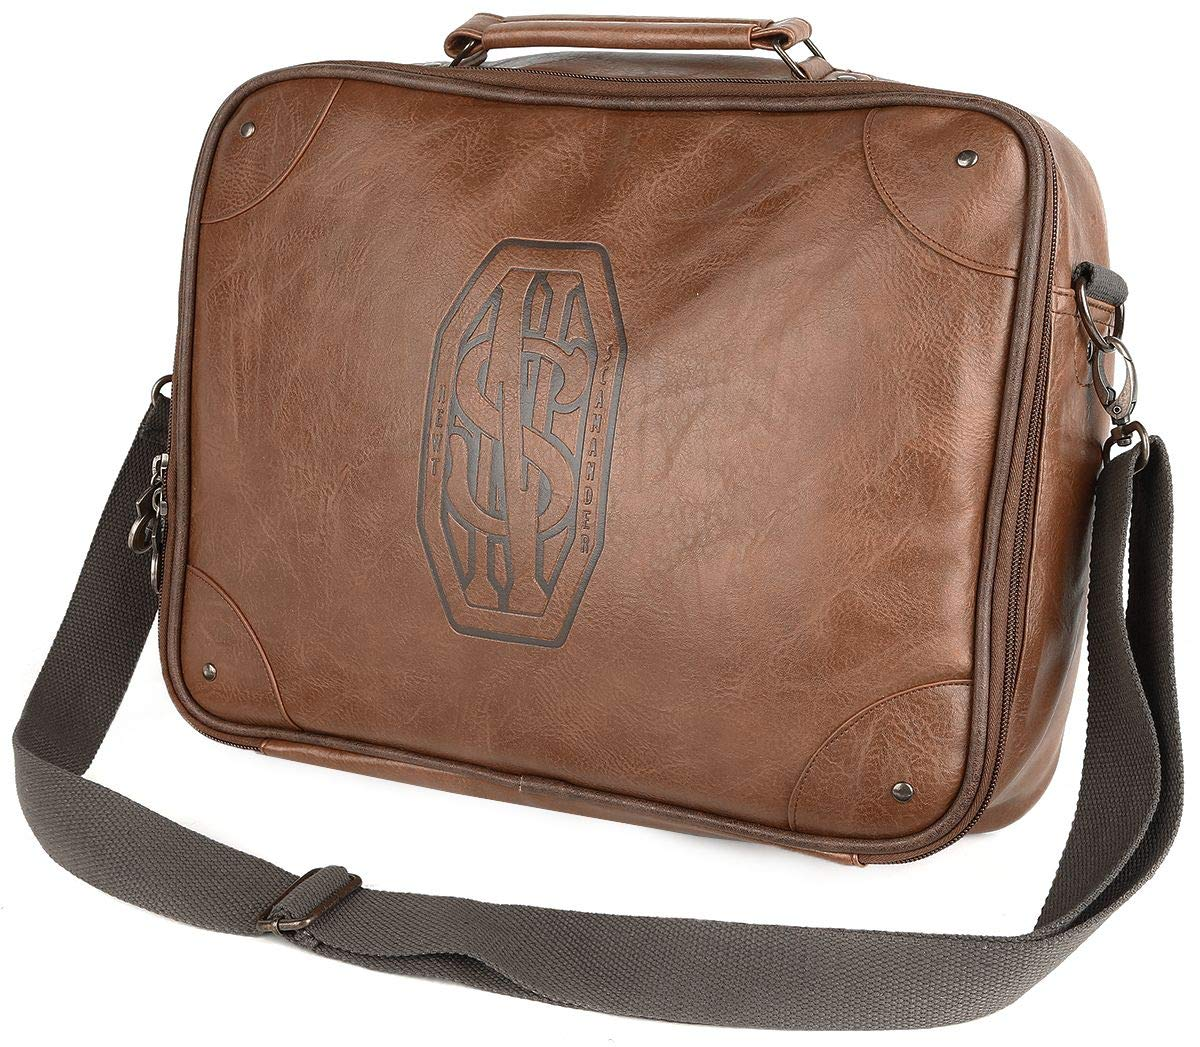 Fantastic Beasts Newt Scamander's Suitcase Shoulder Bag Brown